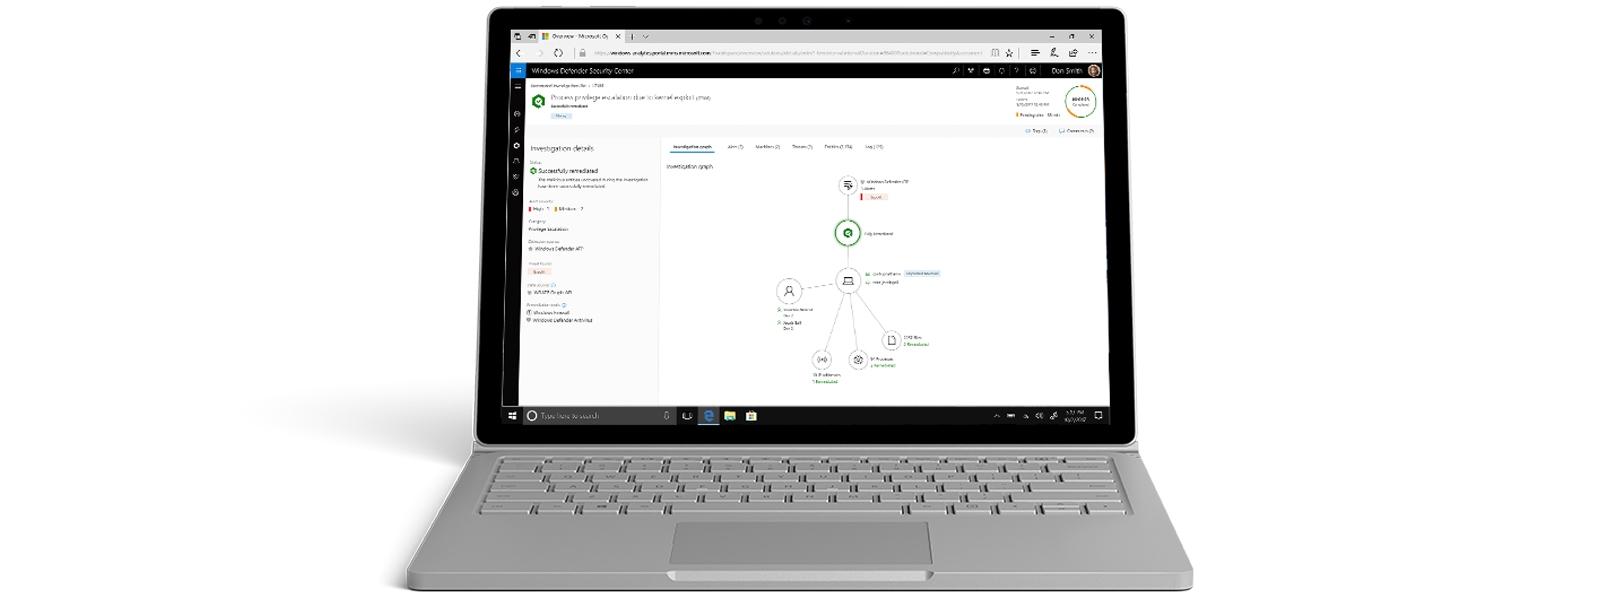 Surface 筆記型電腦螢幕顯示 Windows Defender 中心